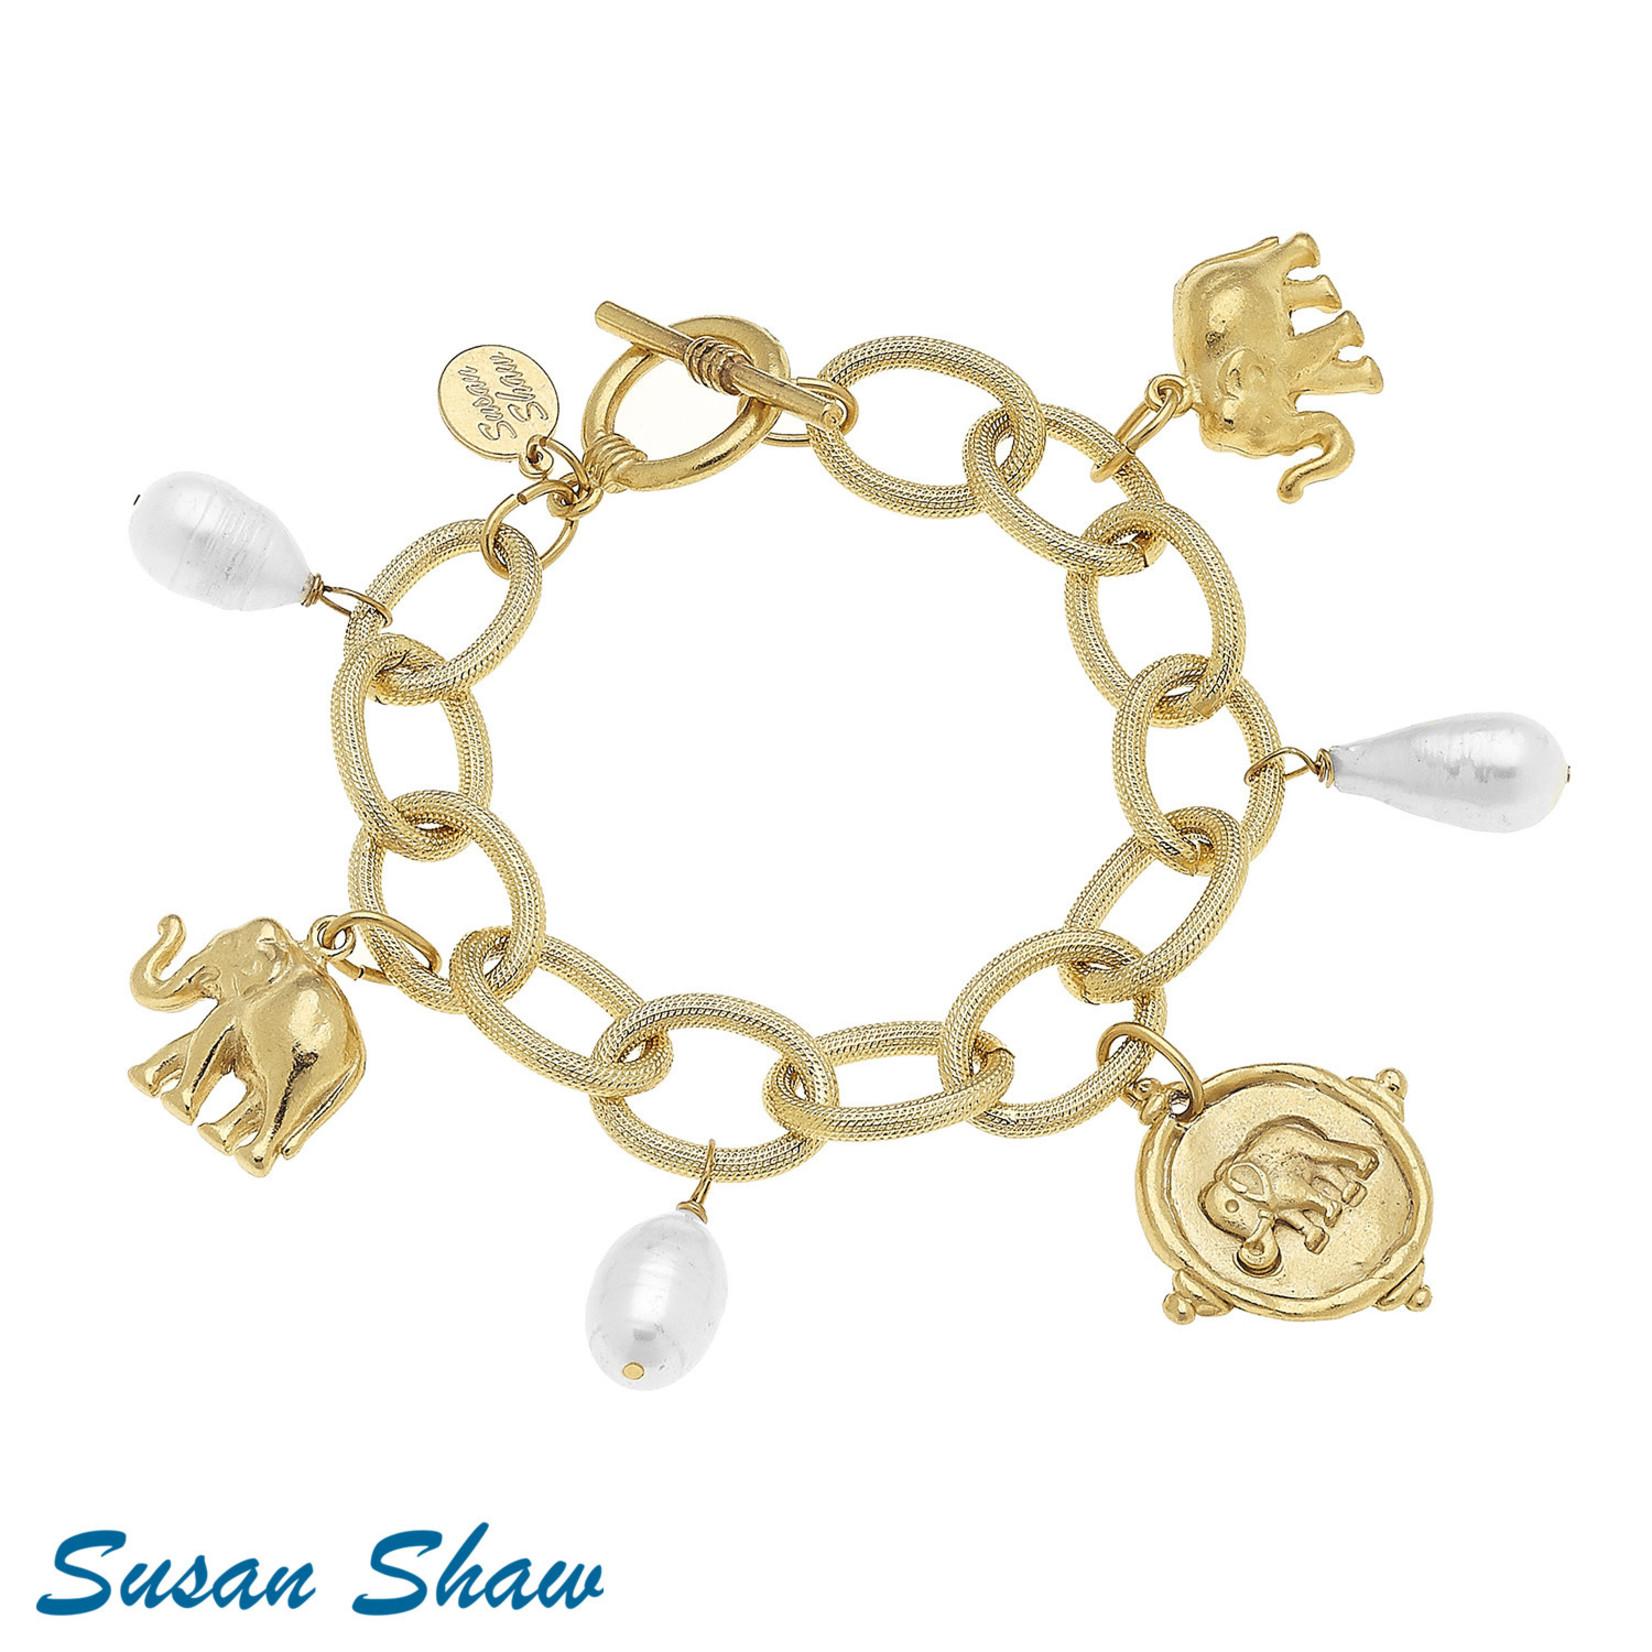 Susan Shaw Susan Shaw Charm Bracelet